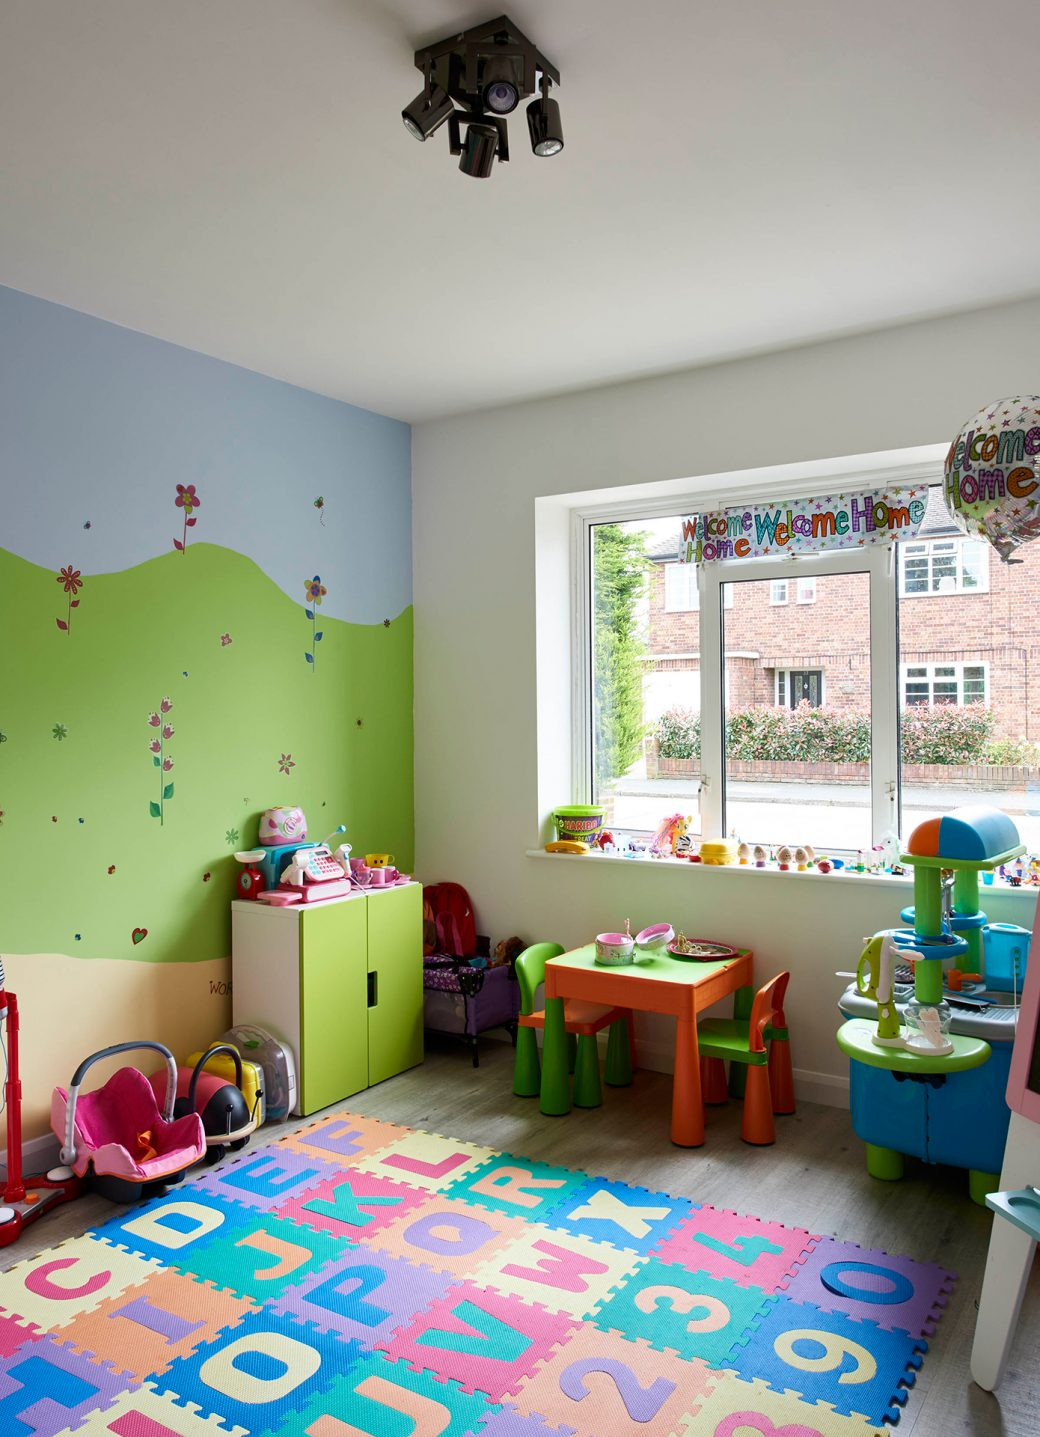 A fantastic children's play room